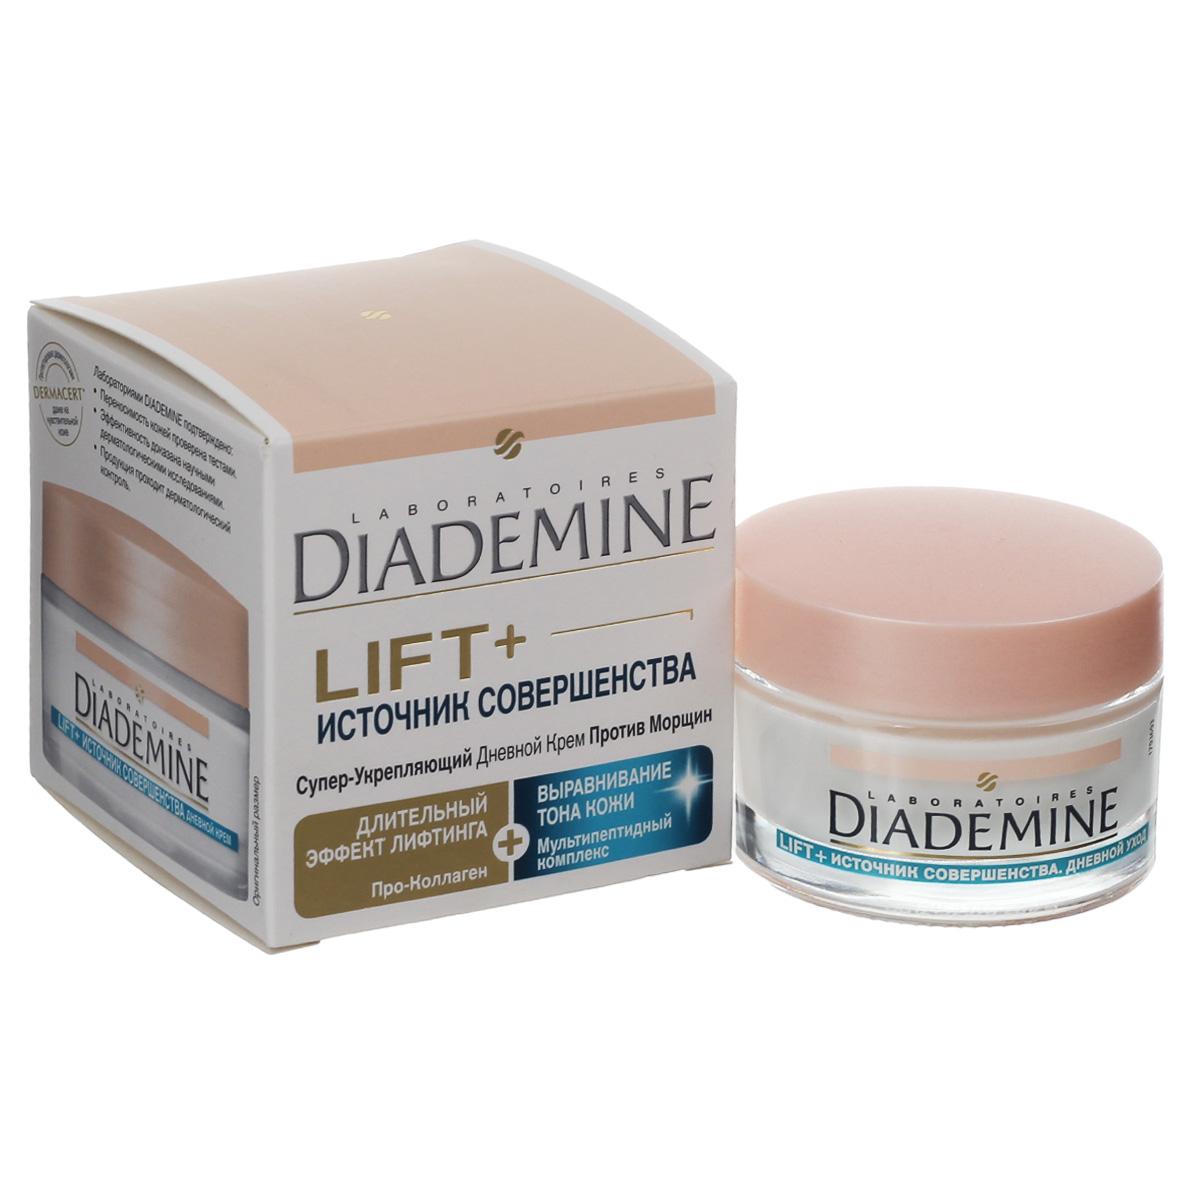 DIADEMINE LIFT+ �������� ������������ ������� ����, 50 �� - Diademine1824862DIADEMINE LIFT+�������� ������������ ������� ���� ������� ����������� ��� ����, �������� �� ���������, ������� � ��������, �������� � ���������, ������ ���� ����� ���������� � �������. ���������� �������, ����������� ��������������� ����������, ��������� � ��������� ����� ����, �������� �������� ���������� ����. ���������� ������������: 30 -50 ���